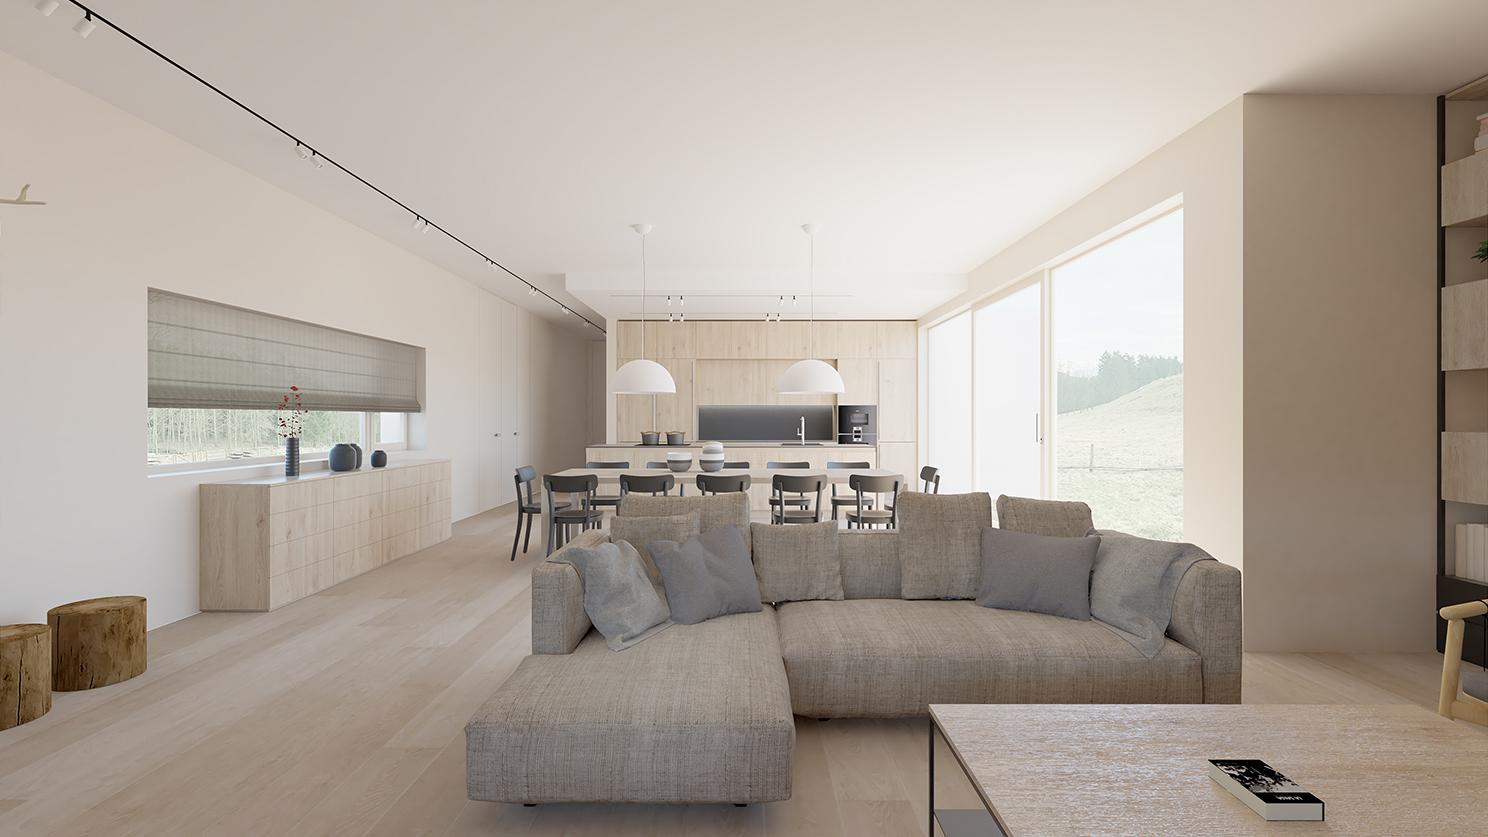 CES SVYC 02 Barbora Leblova Interiors Architecture